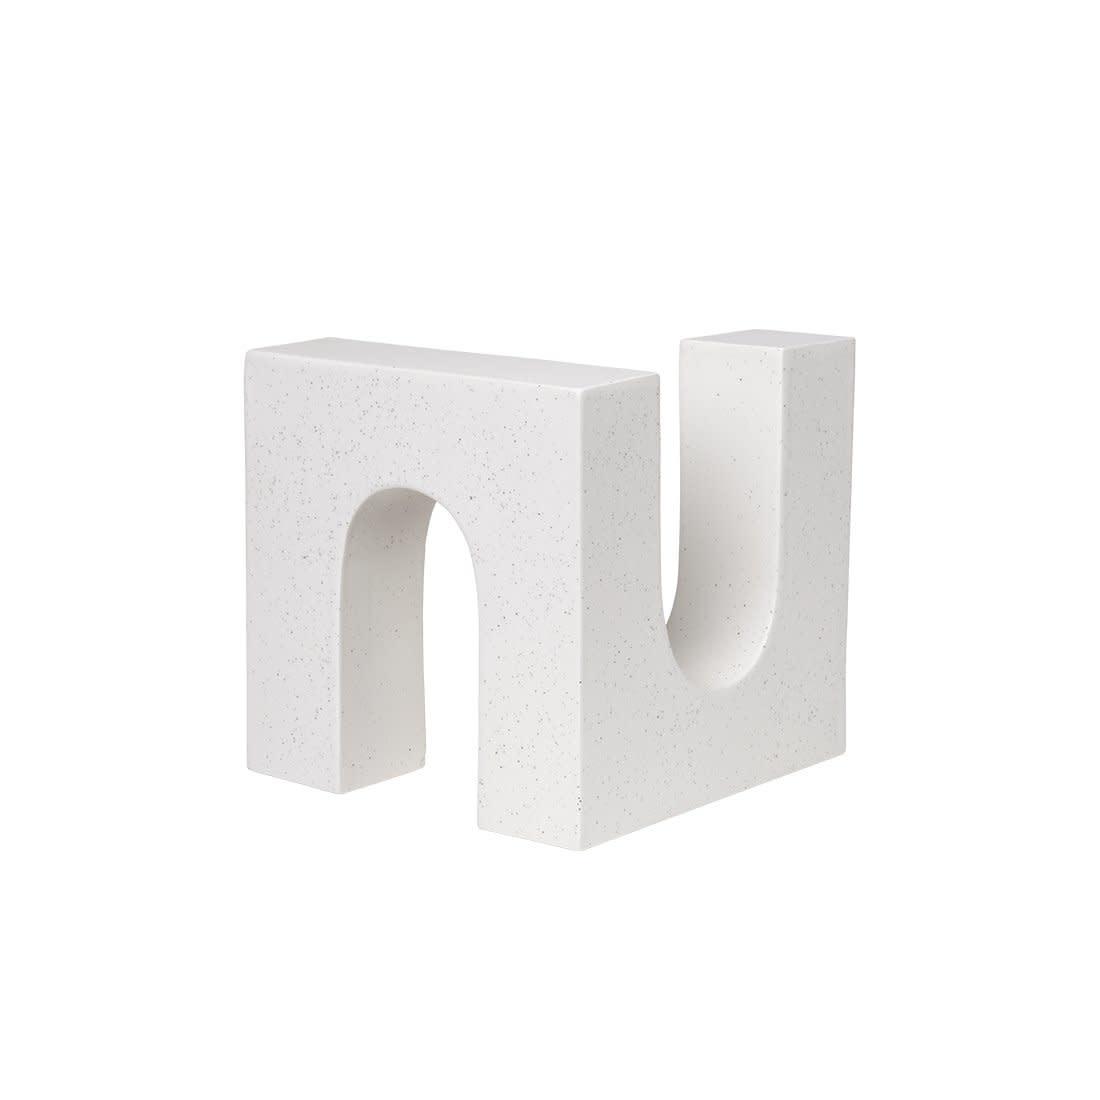 Brick sculpture-1